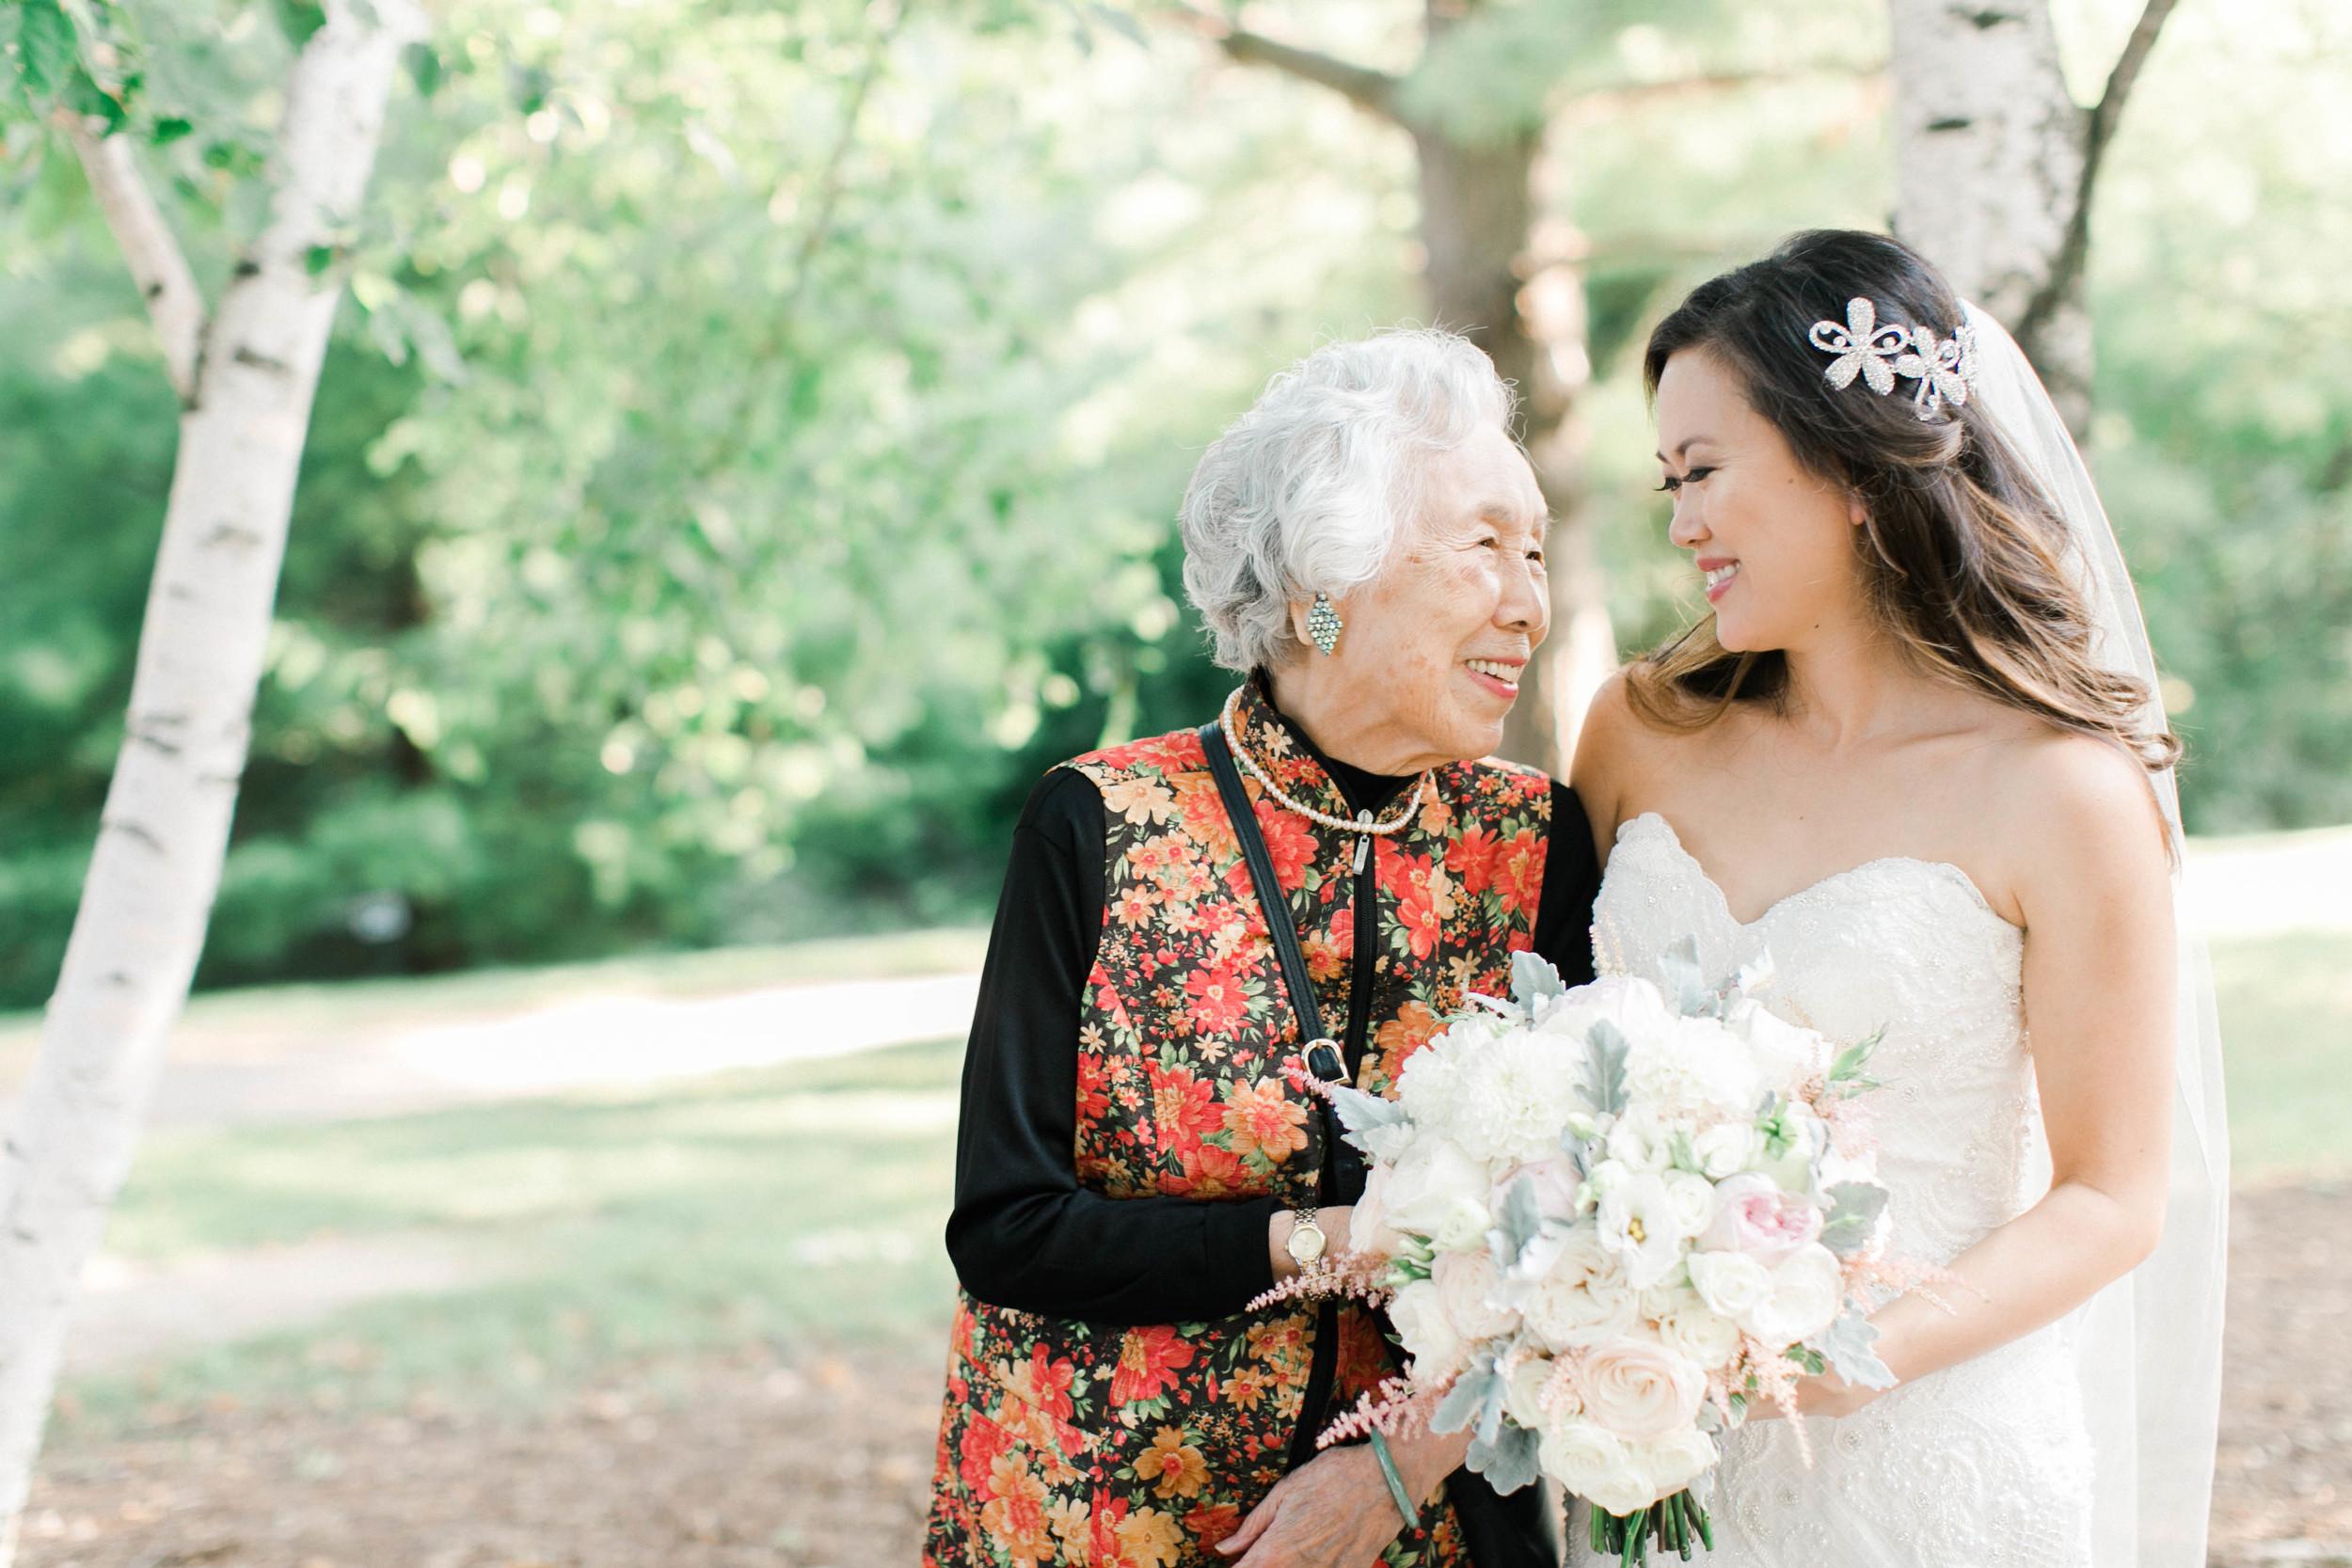 toronto-ontario-wedding-photographer-richelle-hunter-photography-lesley-sean-530.jpg